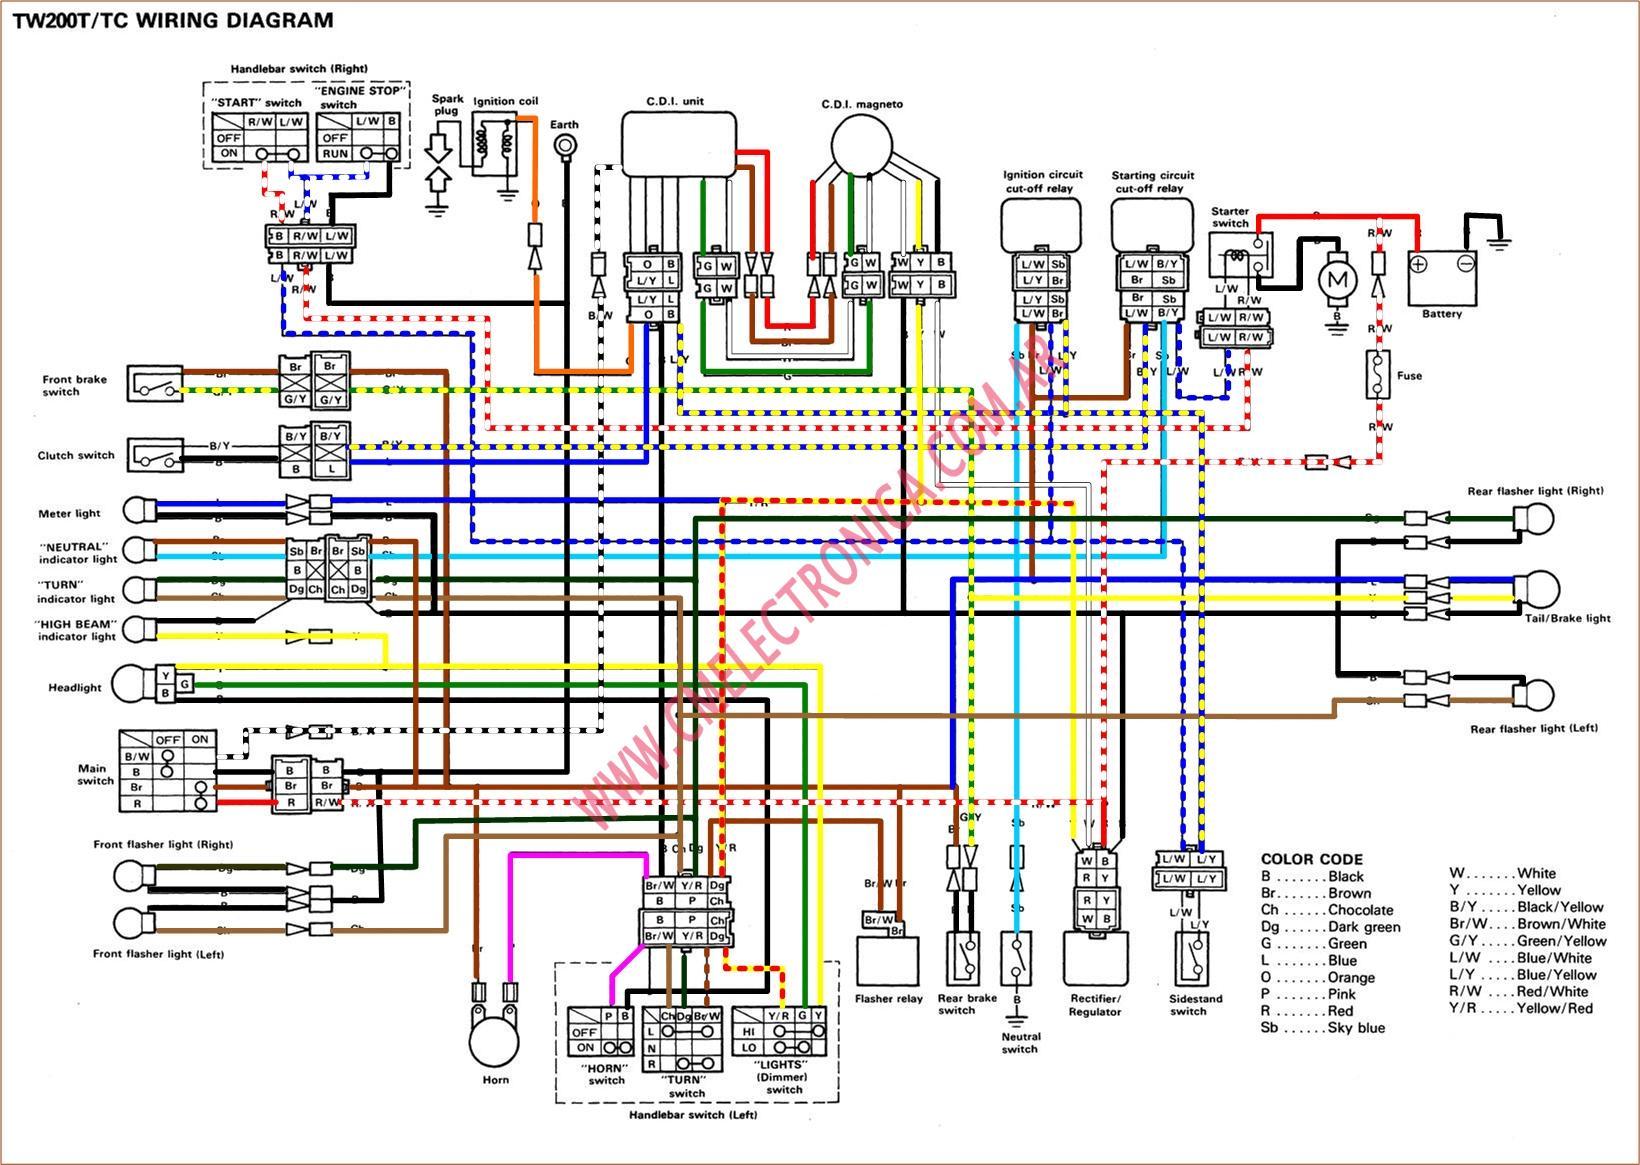 2004 Yamaha Raptor 350 Wiring Harness Diagram